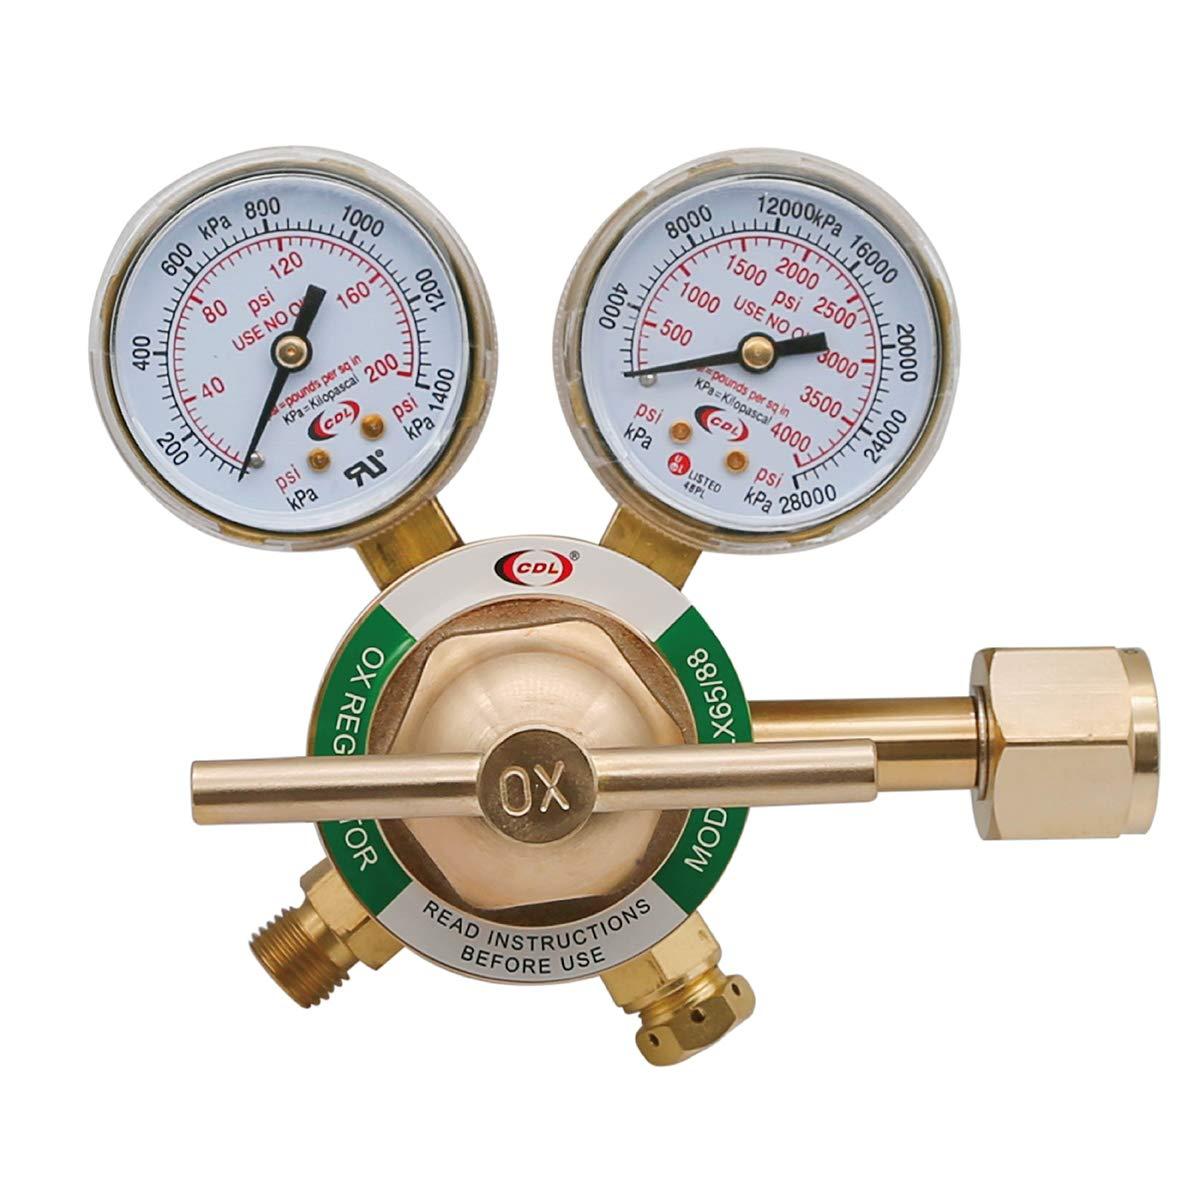 LX65//88 Oxygen Regulator CGA540